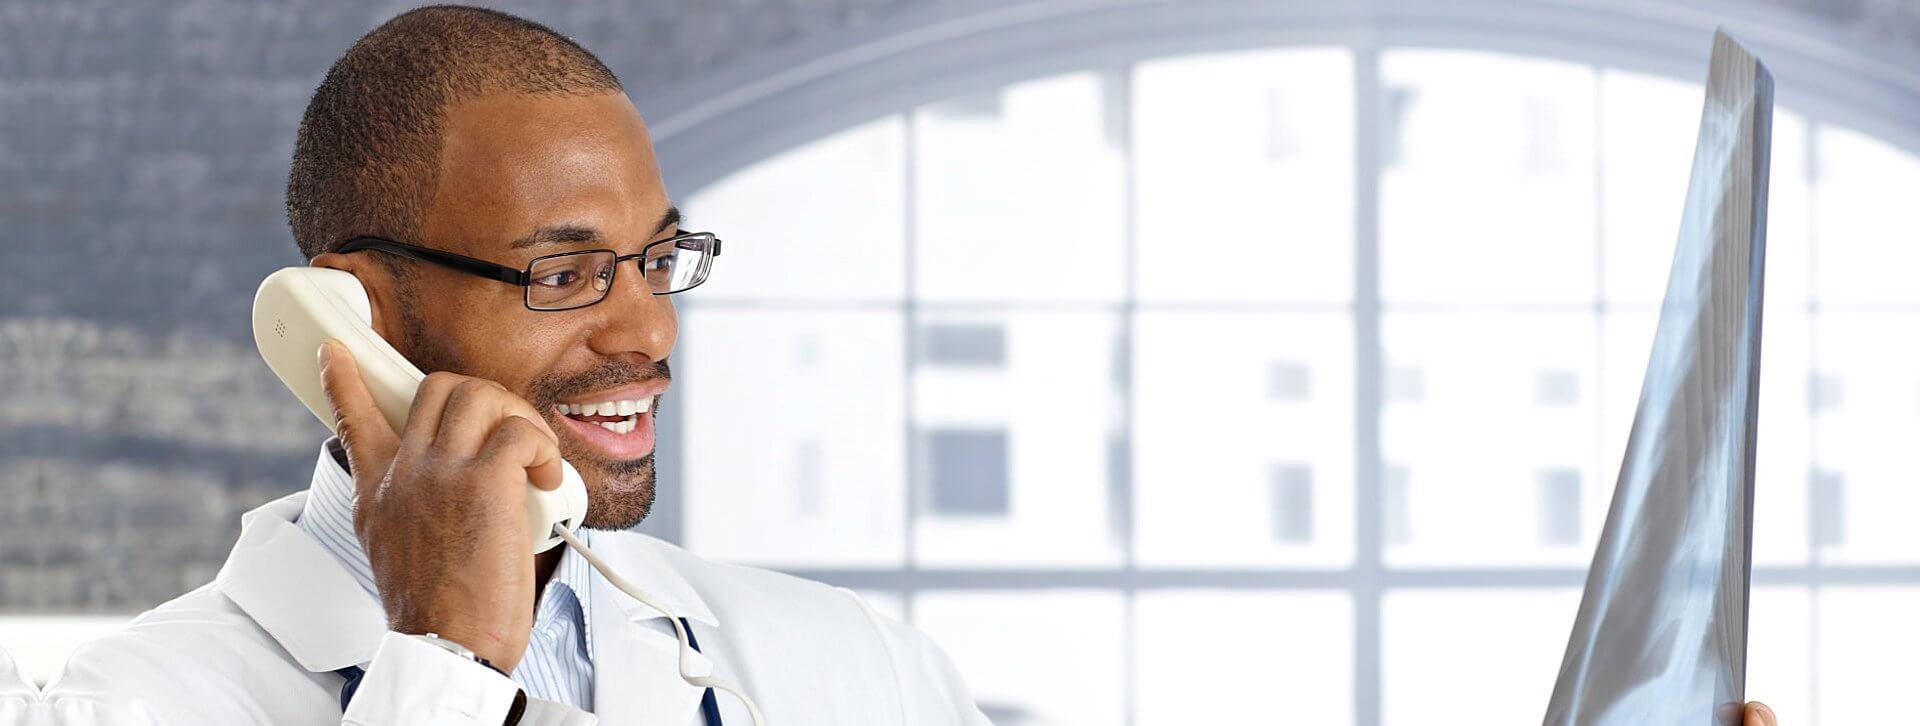 medical staff calling